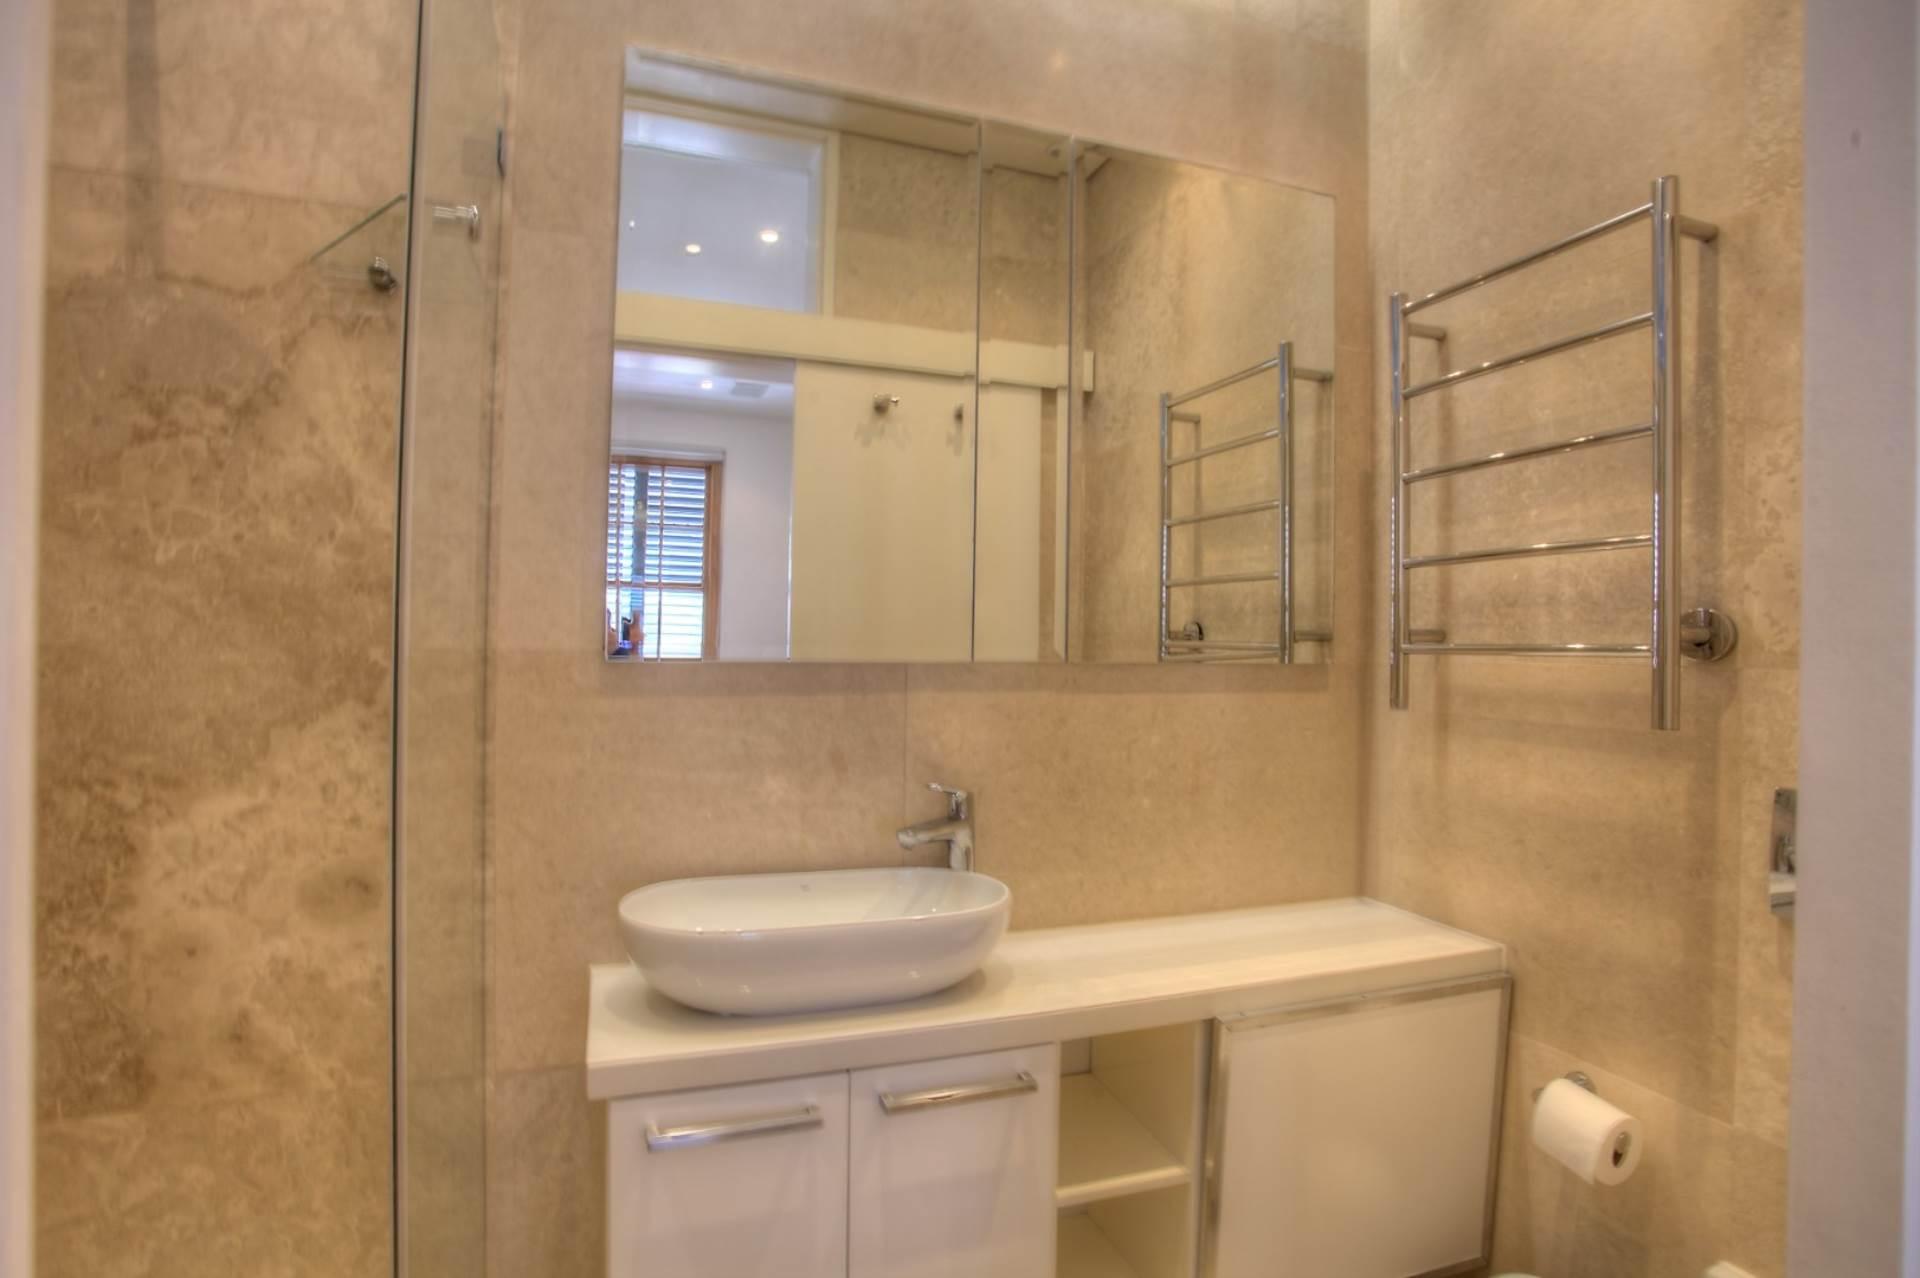 De Waterkant property for sale. Ref No: 13533994. Picture no 25